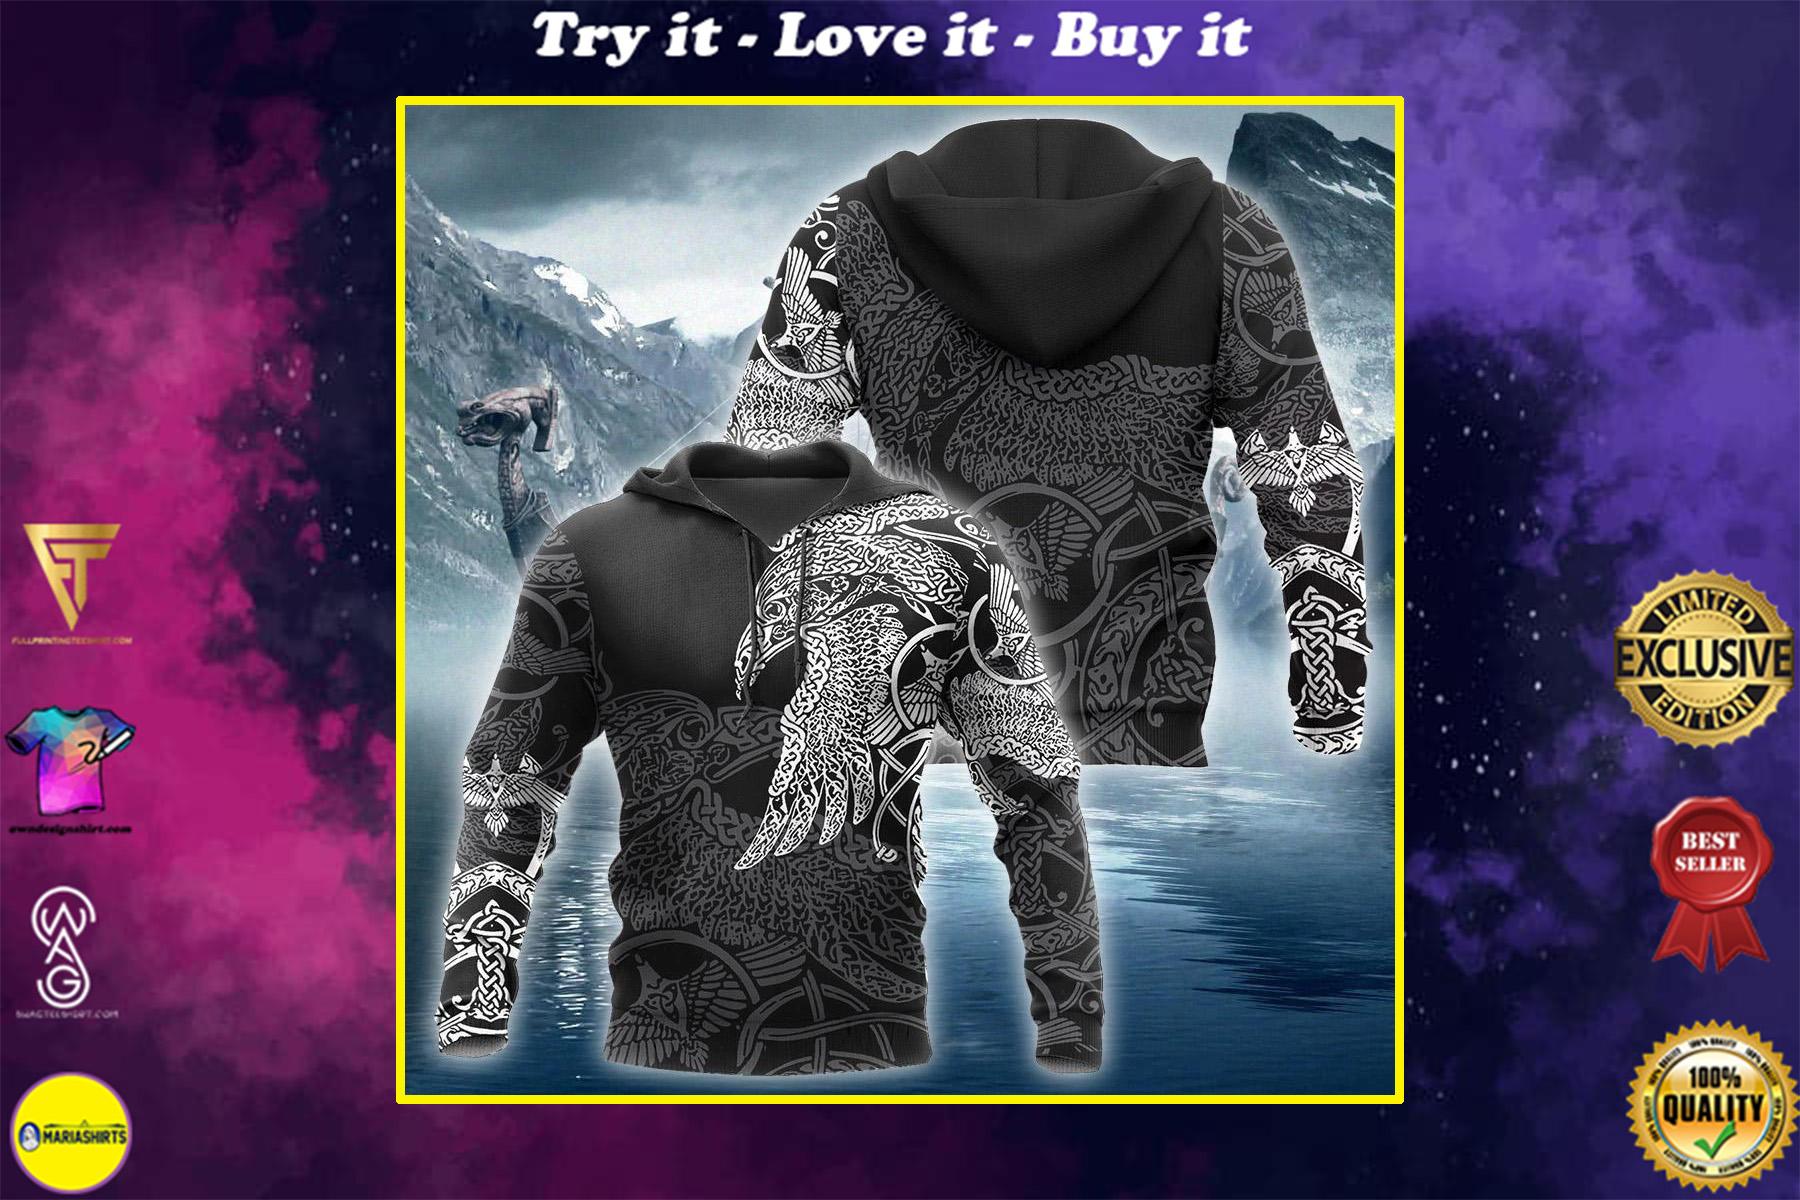 viking munin raven tattoo all over printed shirt